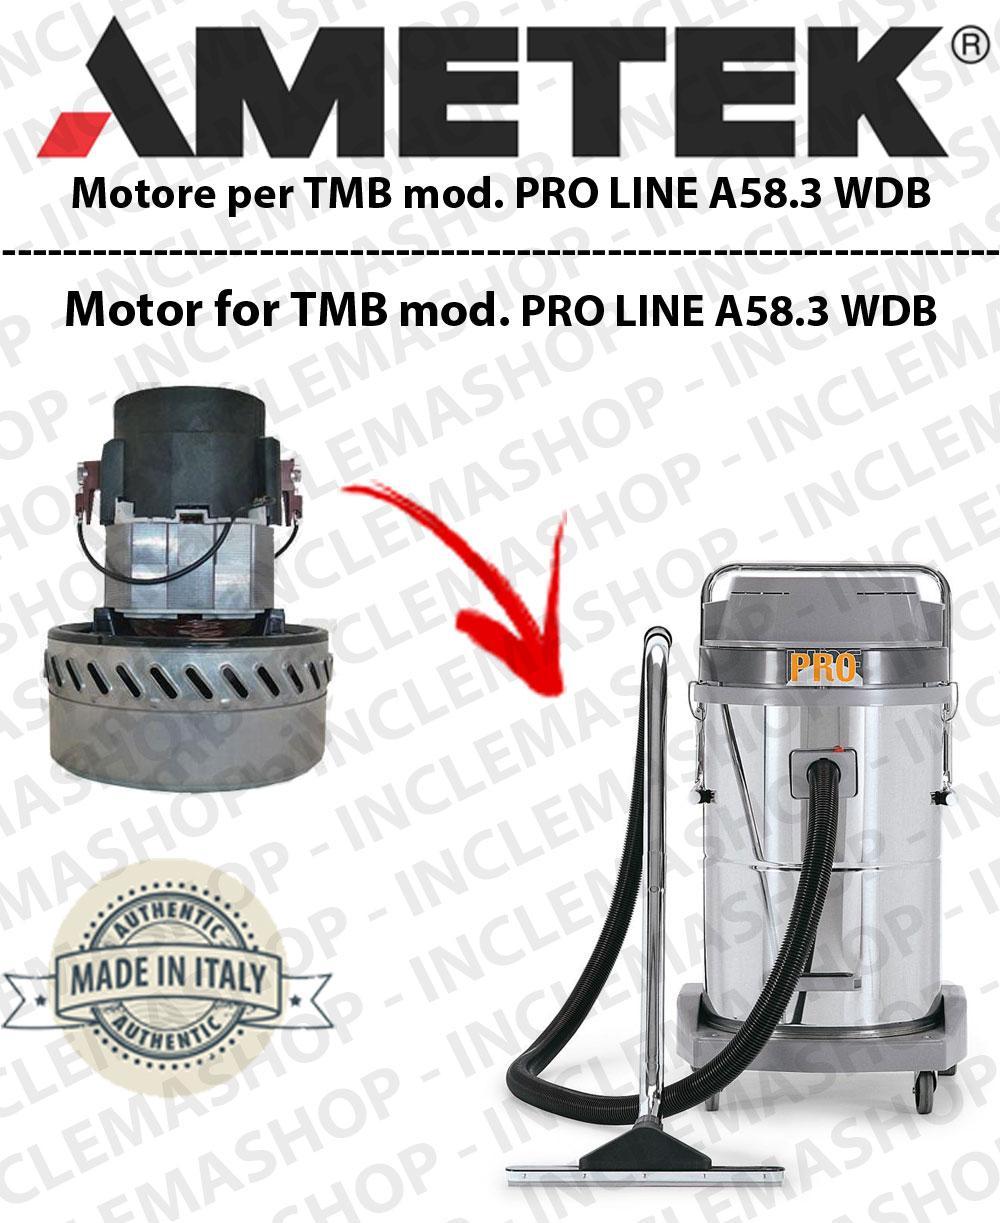 PRO LINE A58.3 WDB Saugmotor AMETEK für Staubsauger und trockensauger TMB